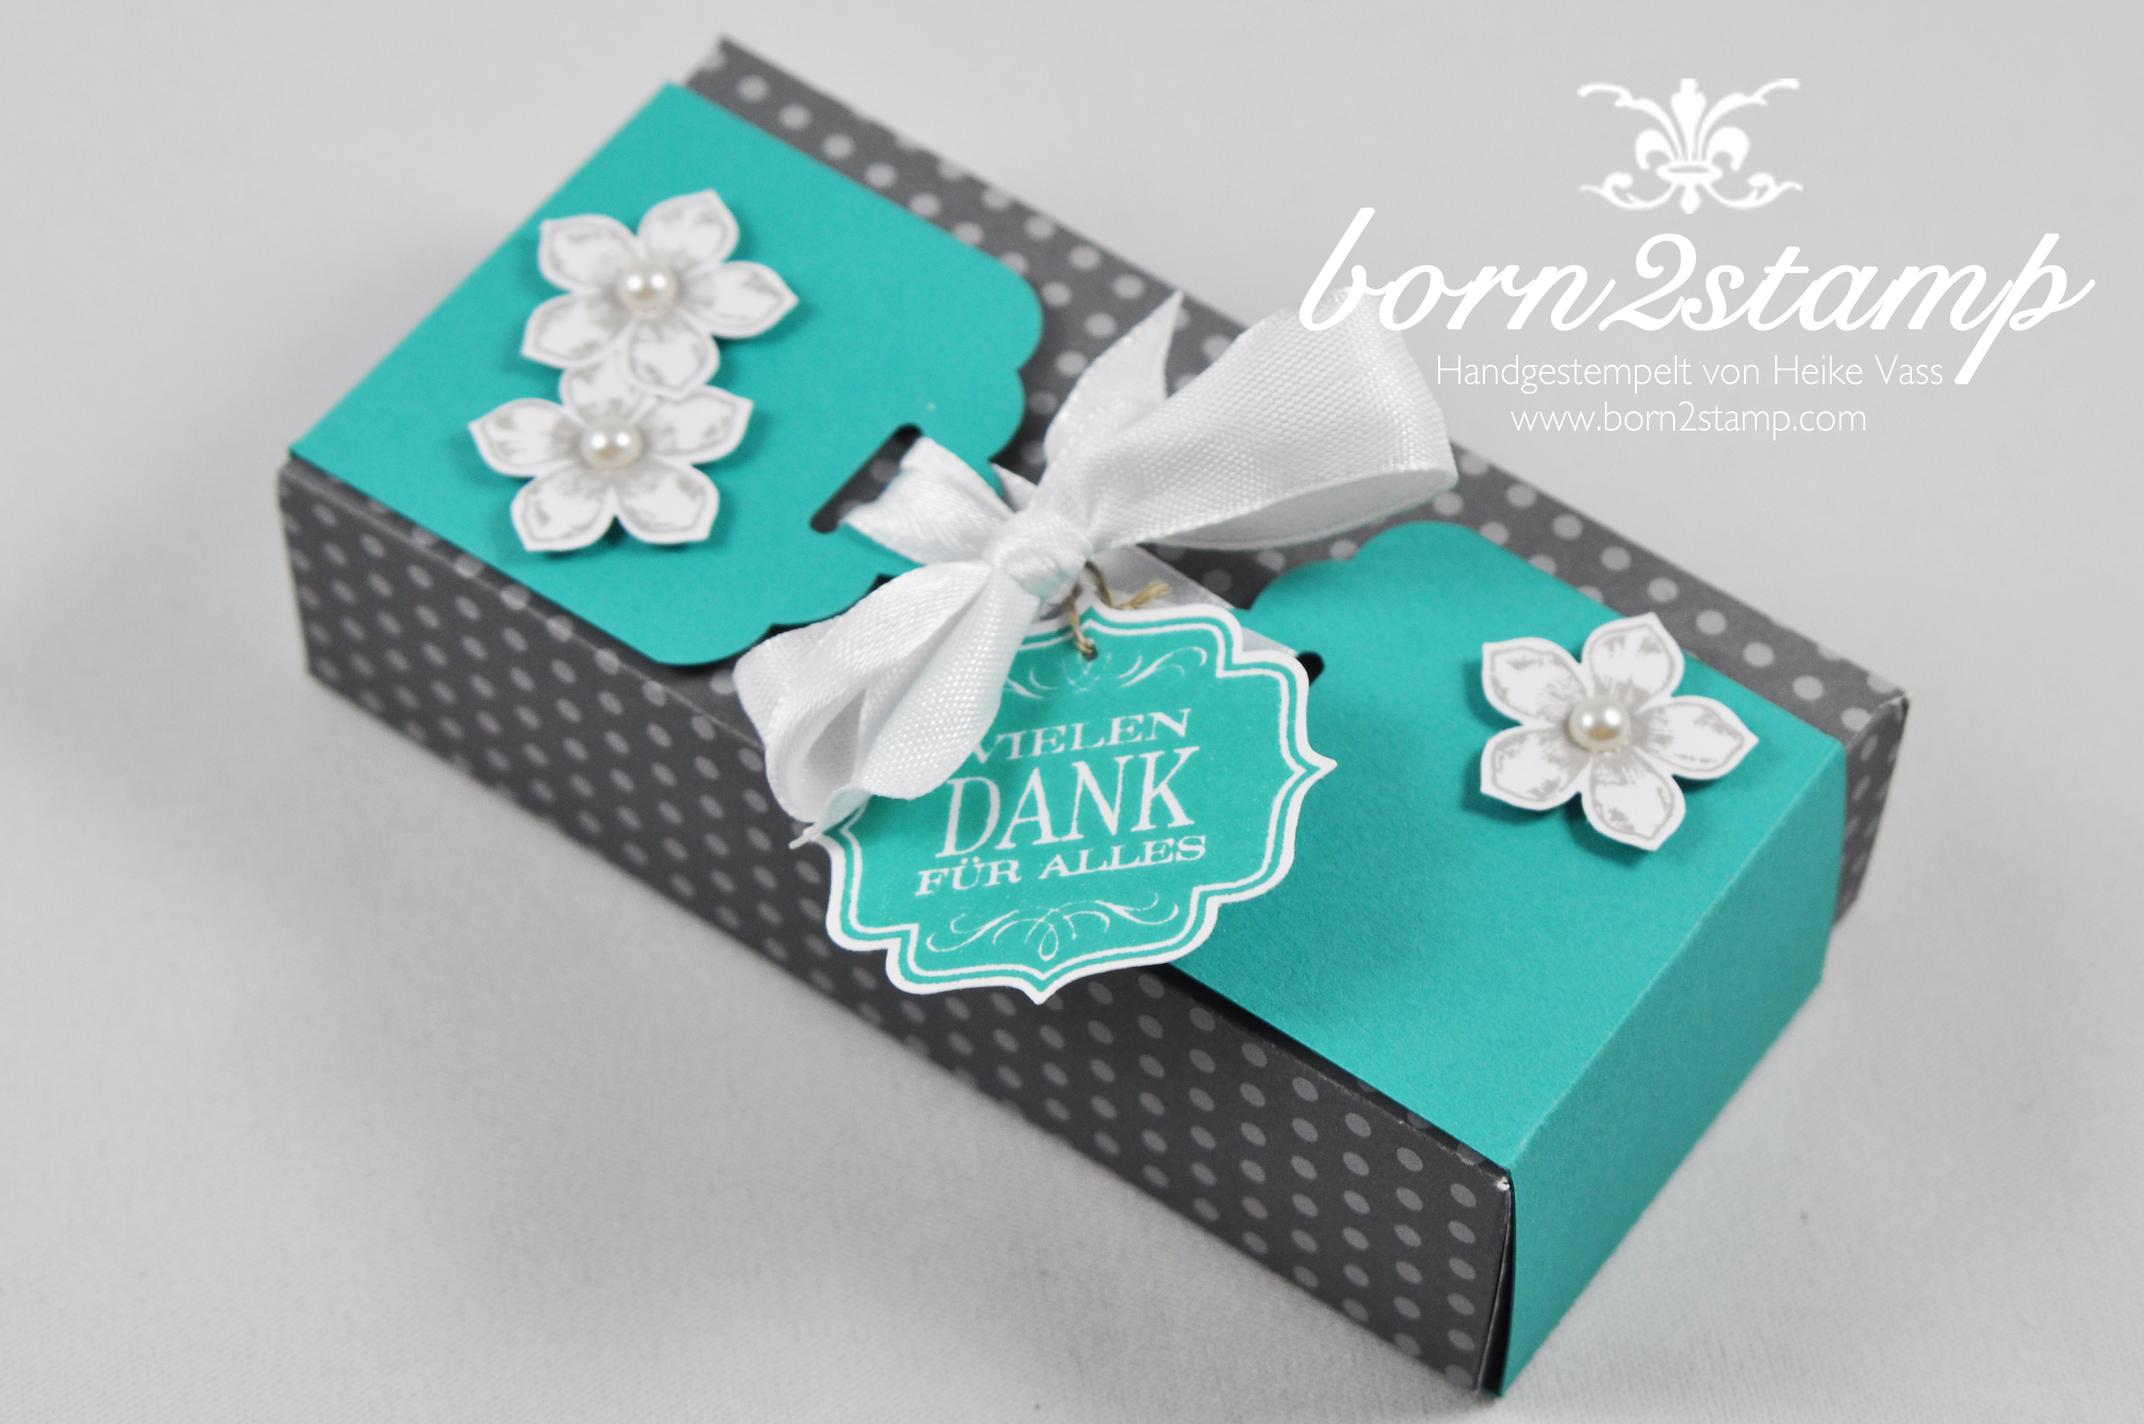 STAMPIN' UP! Verpackung gewellte Anhängerstanze Petite Petals Envelope Punch Board Edles Etikett